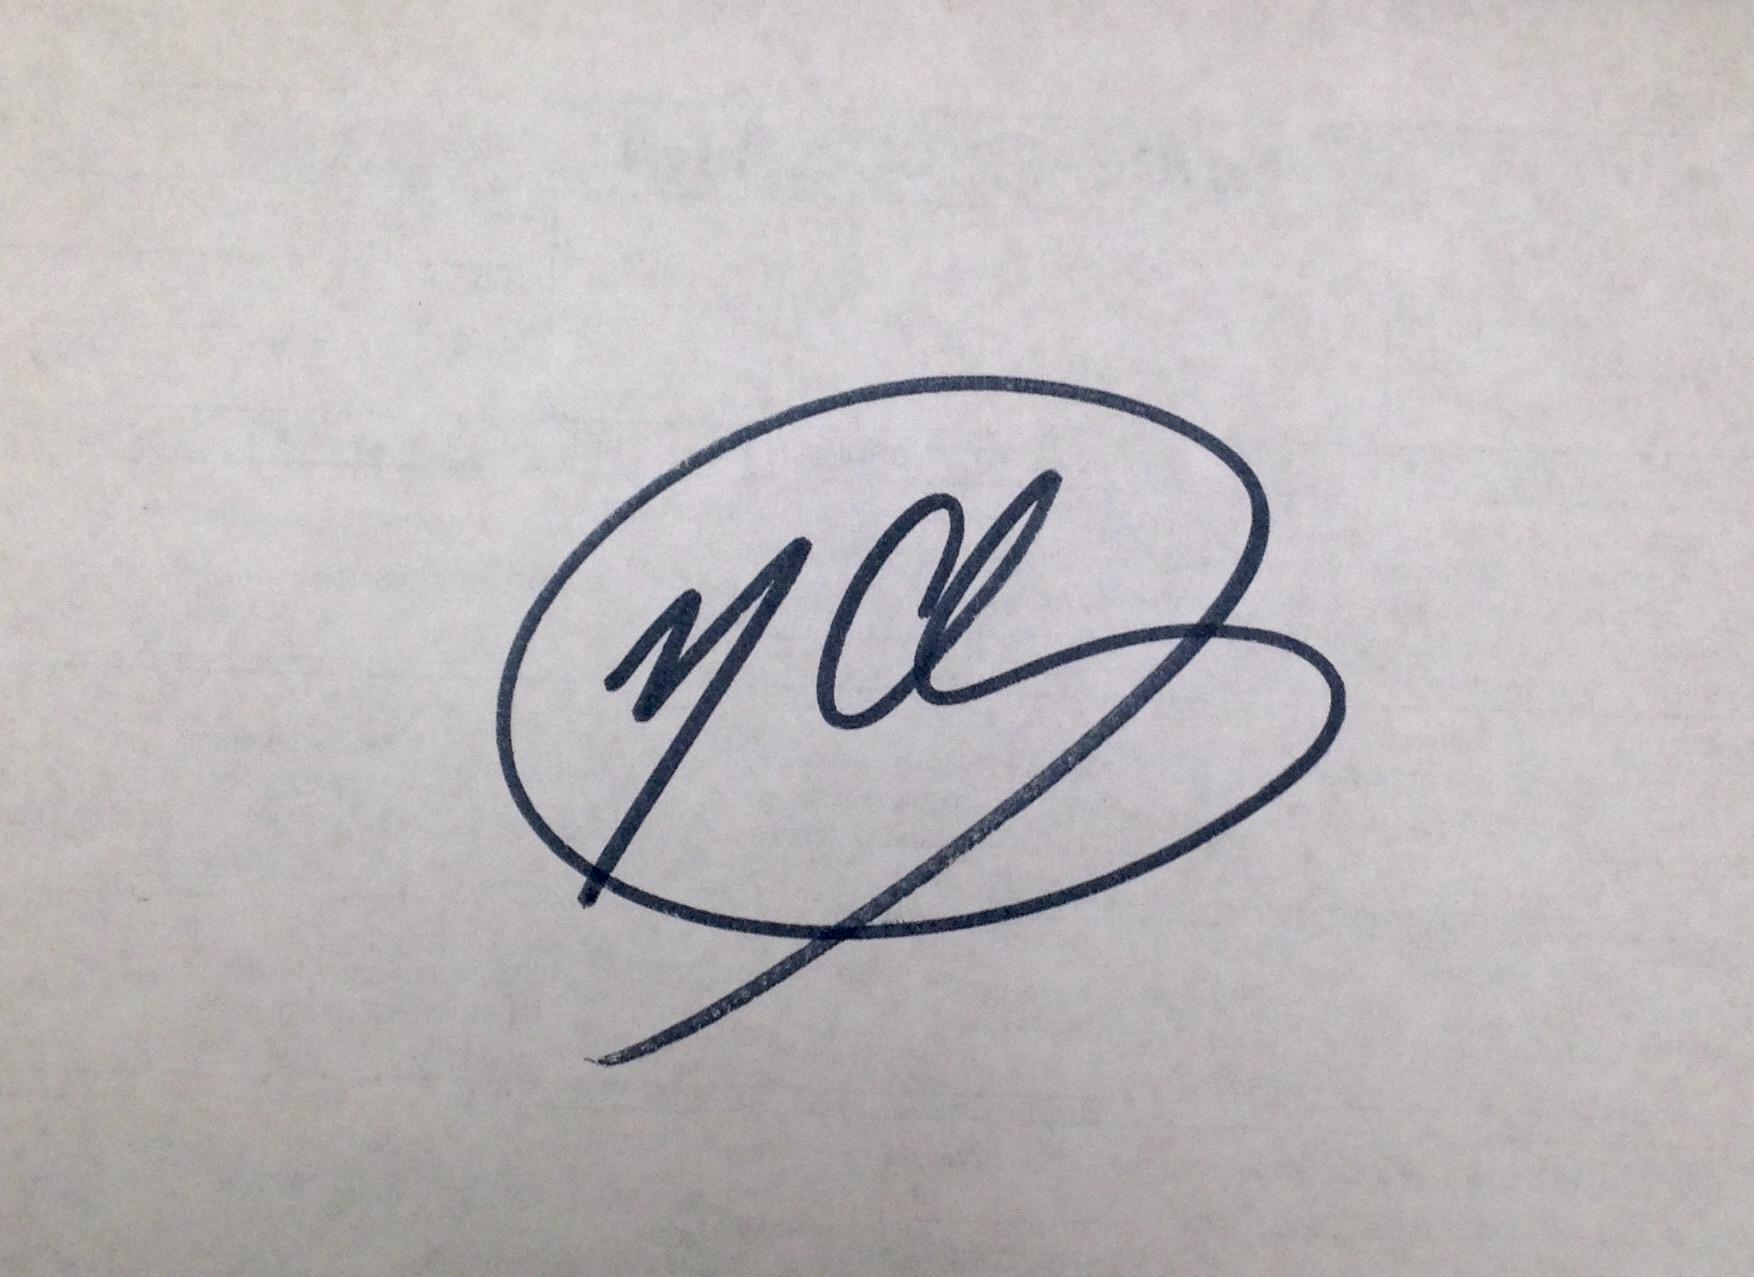 Michael Chewning Signature